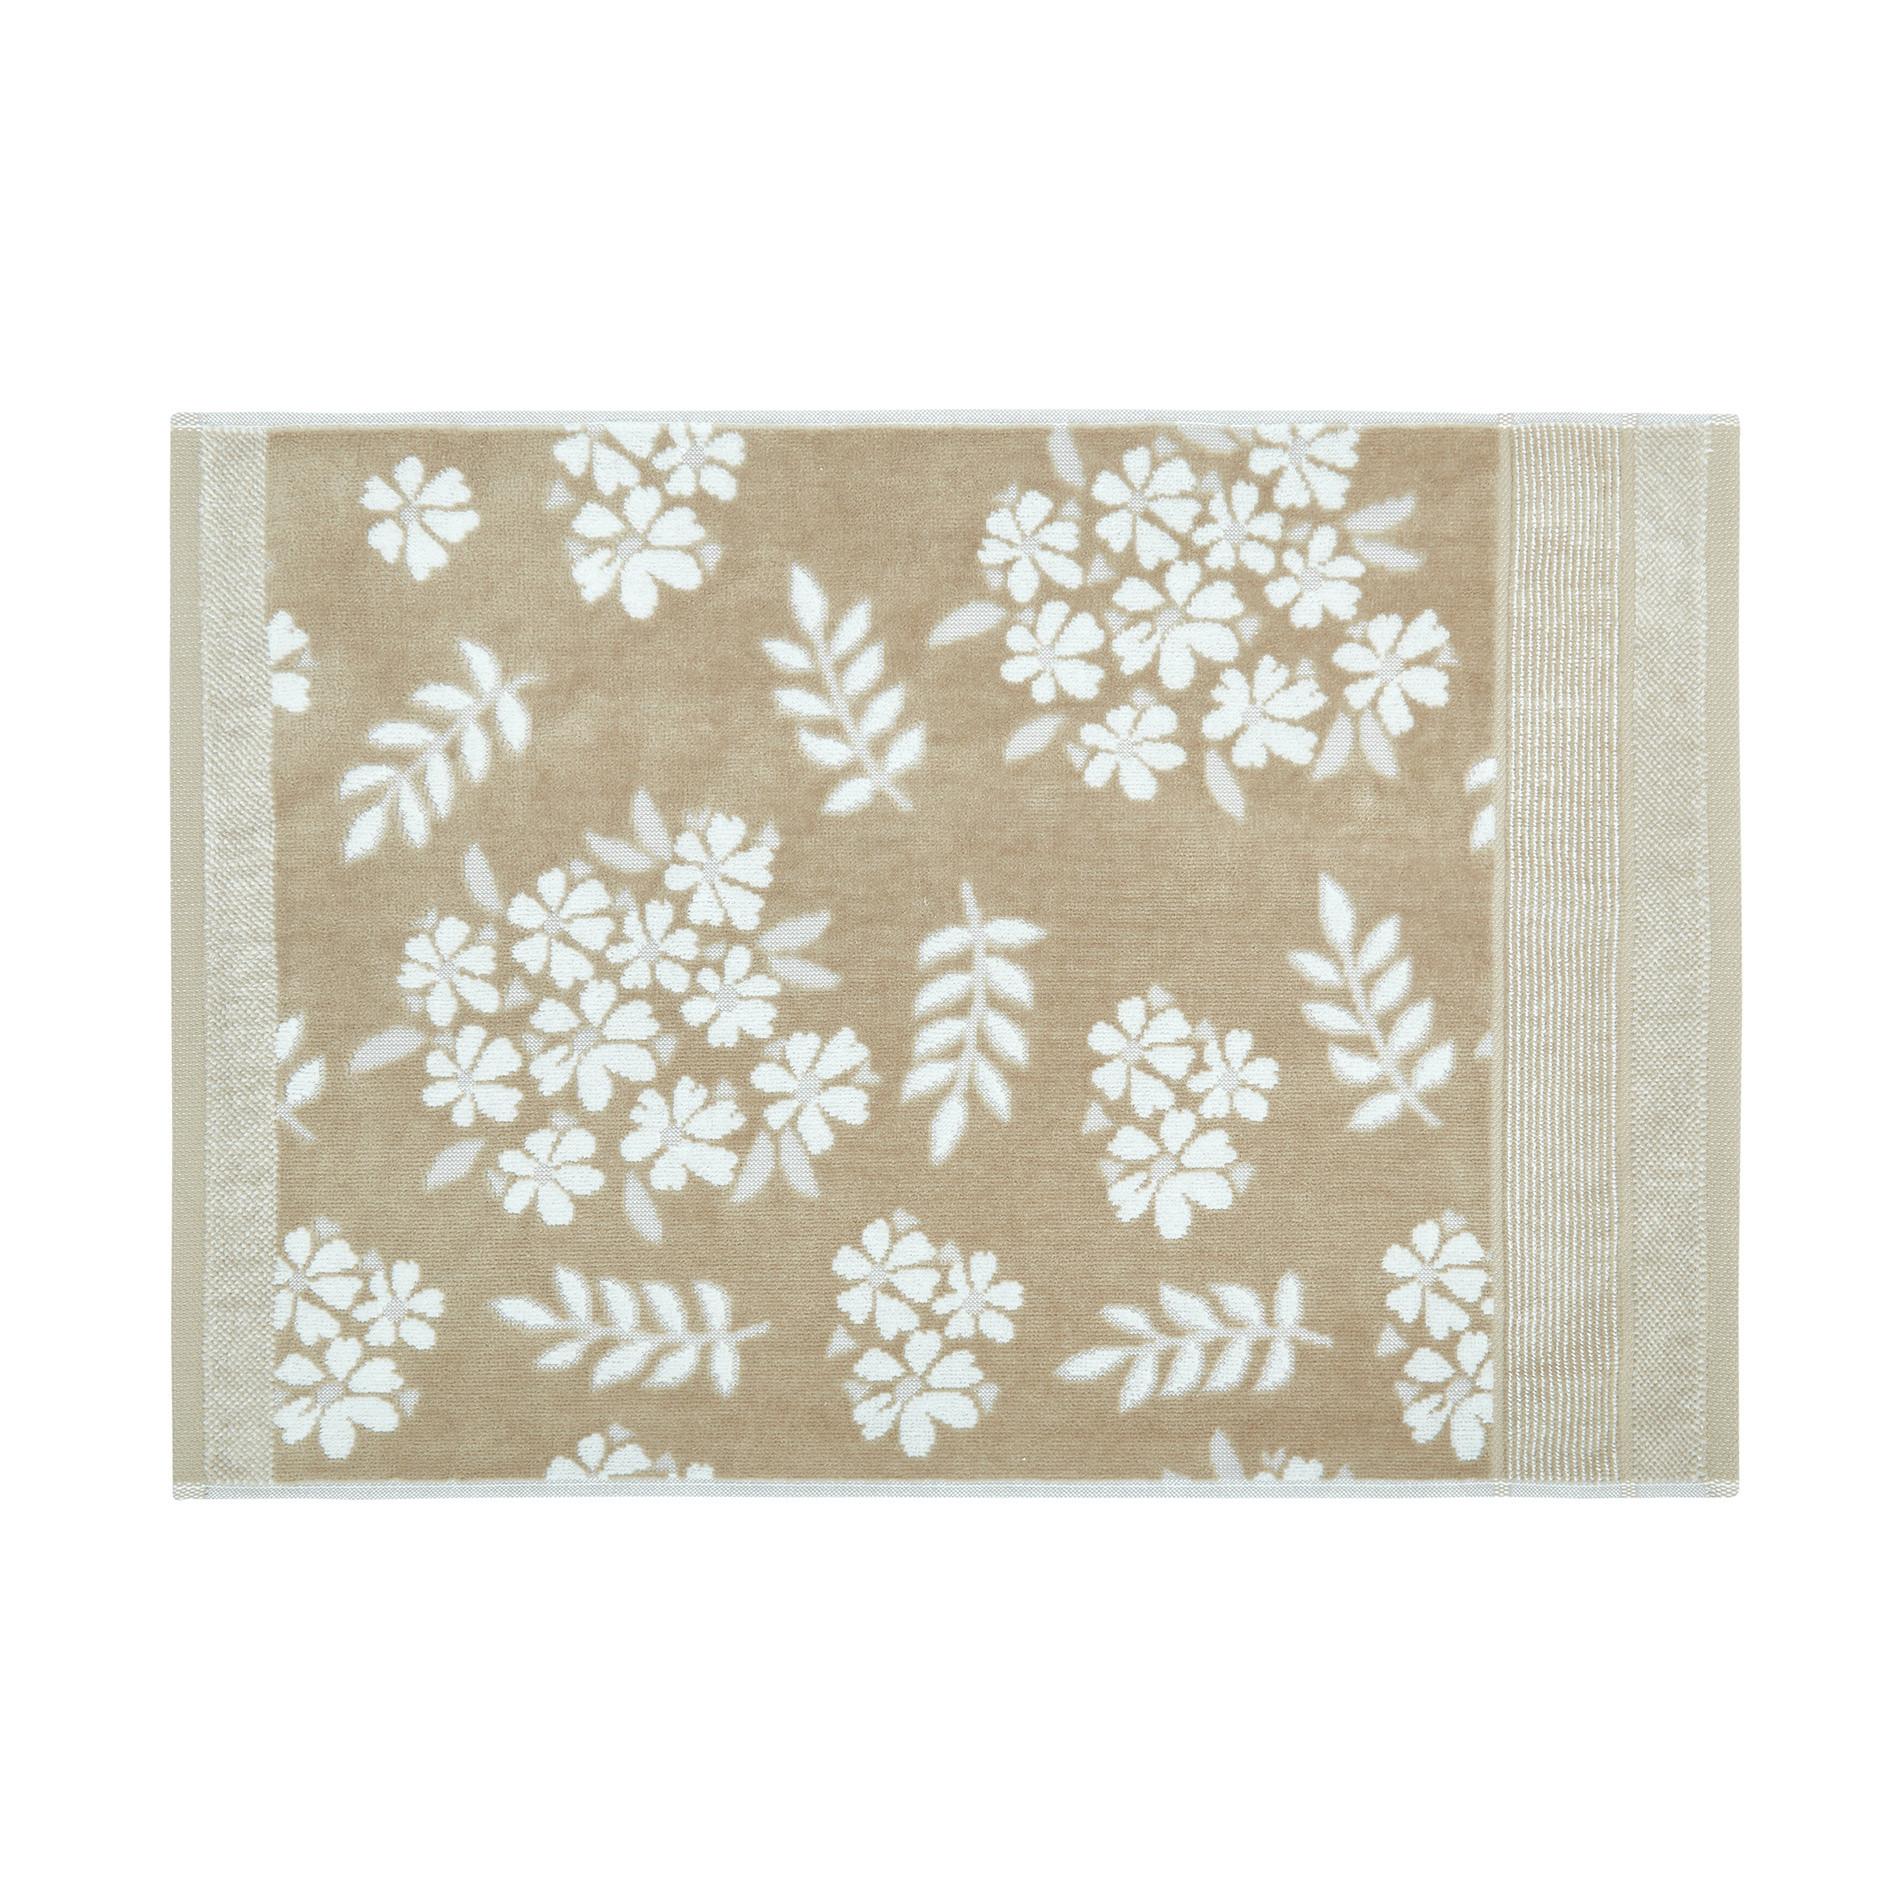 Asciugamano cotone velour motivo floreale Portofino, Beige, large image number 1